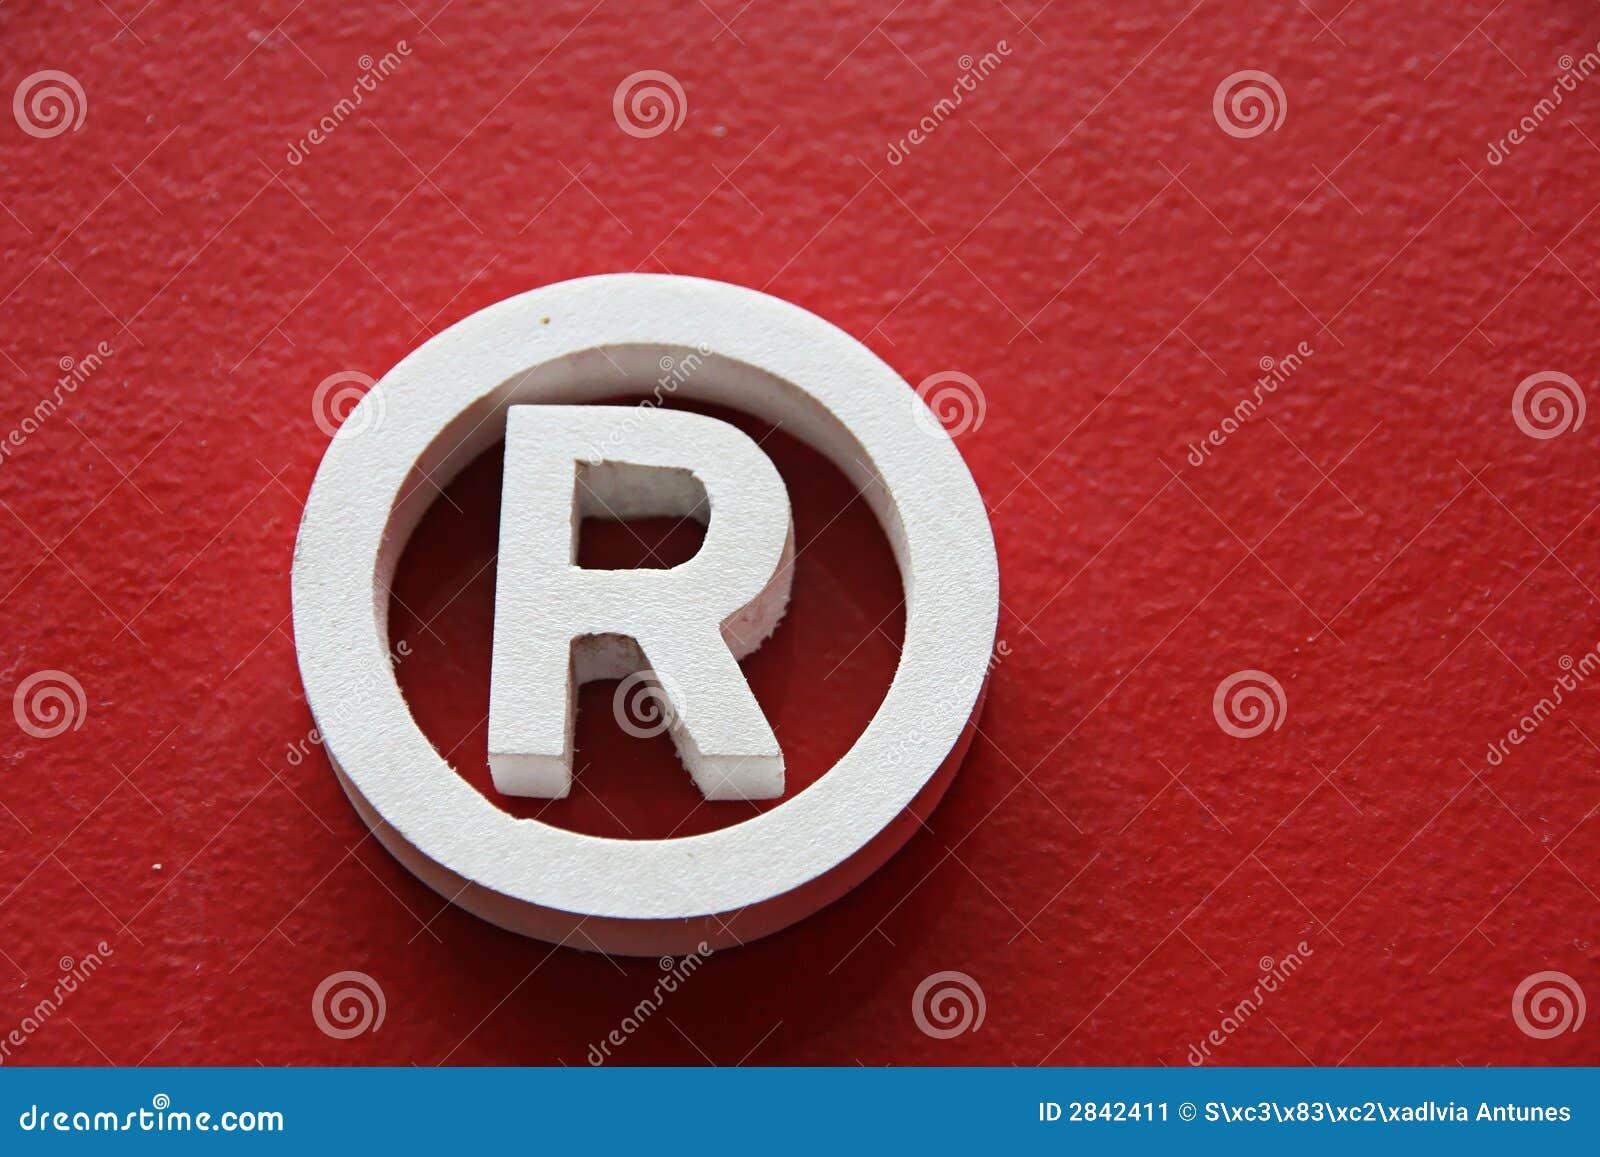 R registered trademark stock image image of copy round 2842411 r registered trademark biocorpaavc